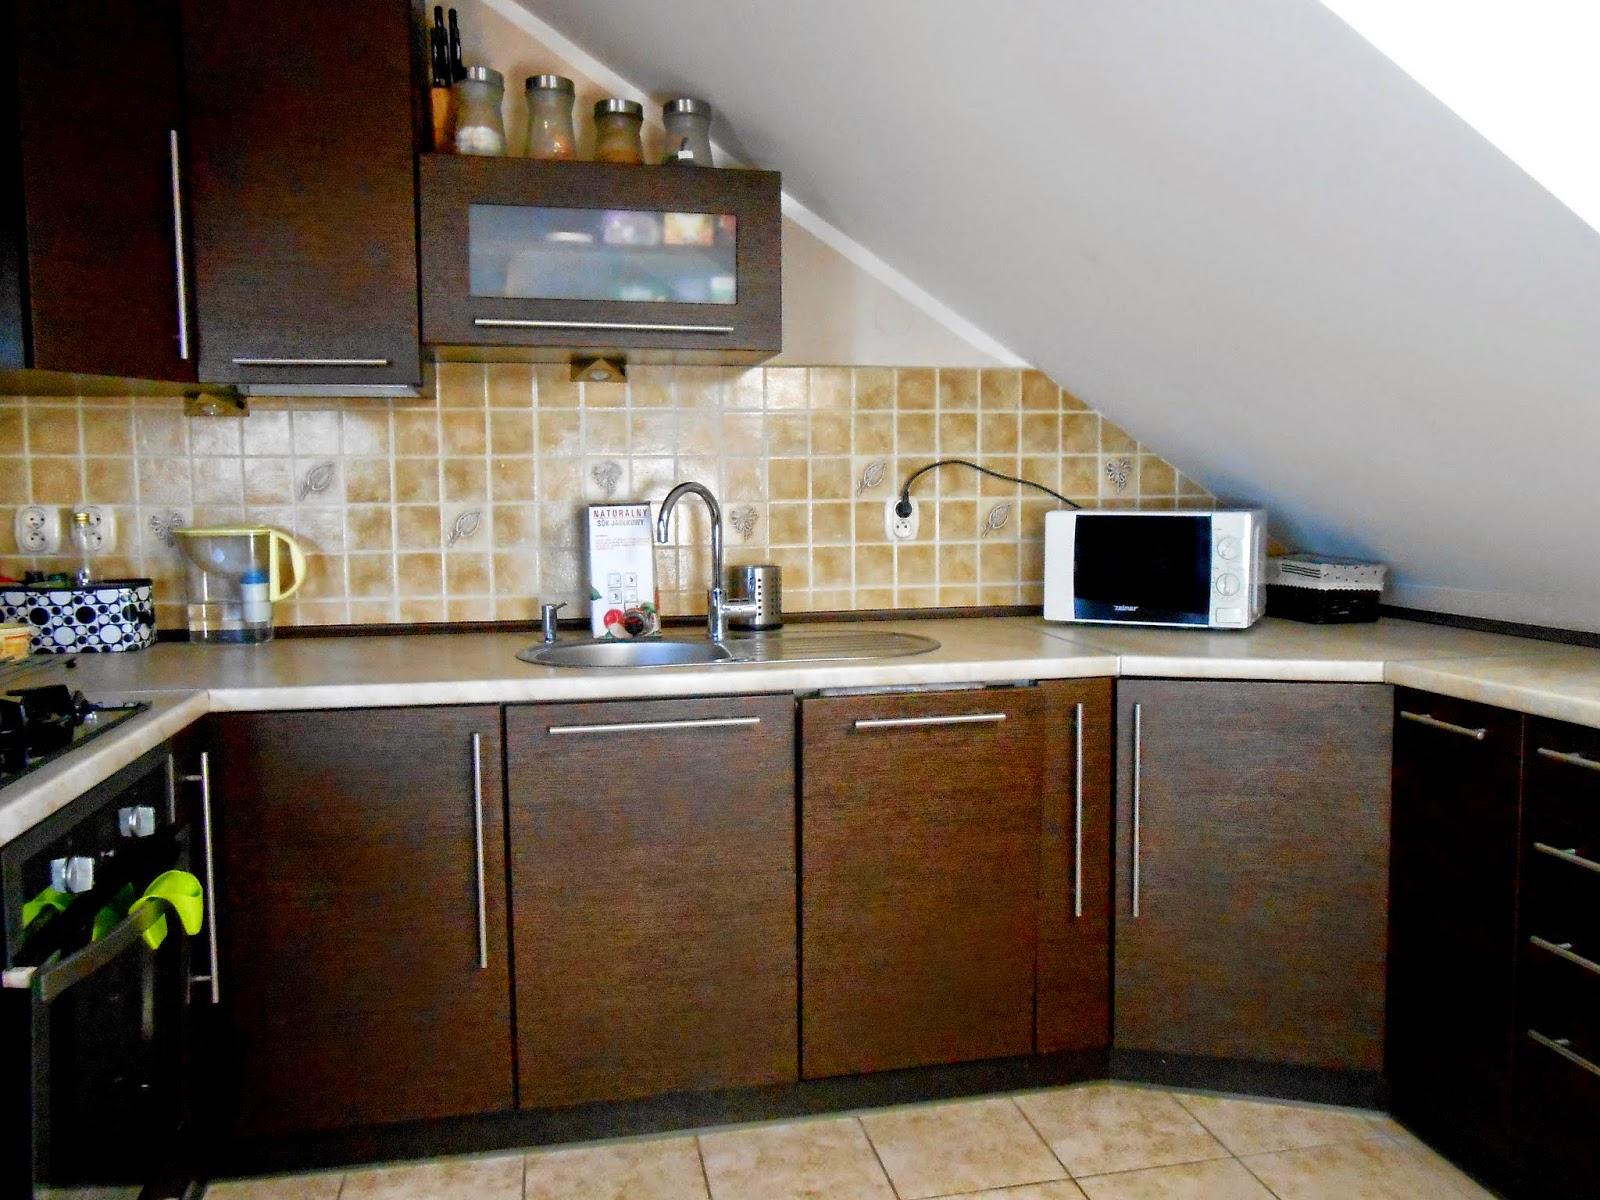 Mała kuchnia na poddaszu  Mama trojki pl -> Salon Kuchnia Na Poddaszu